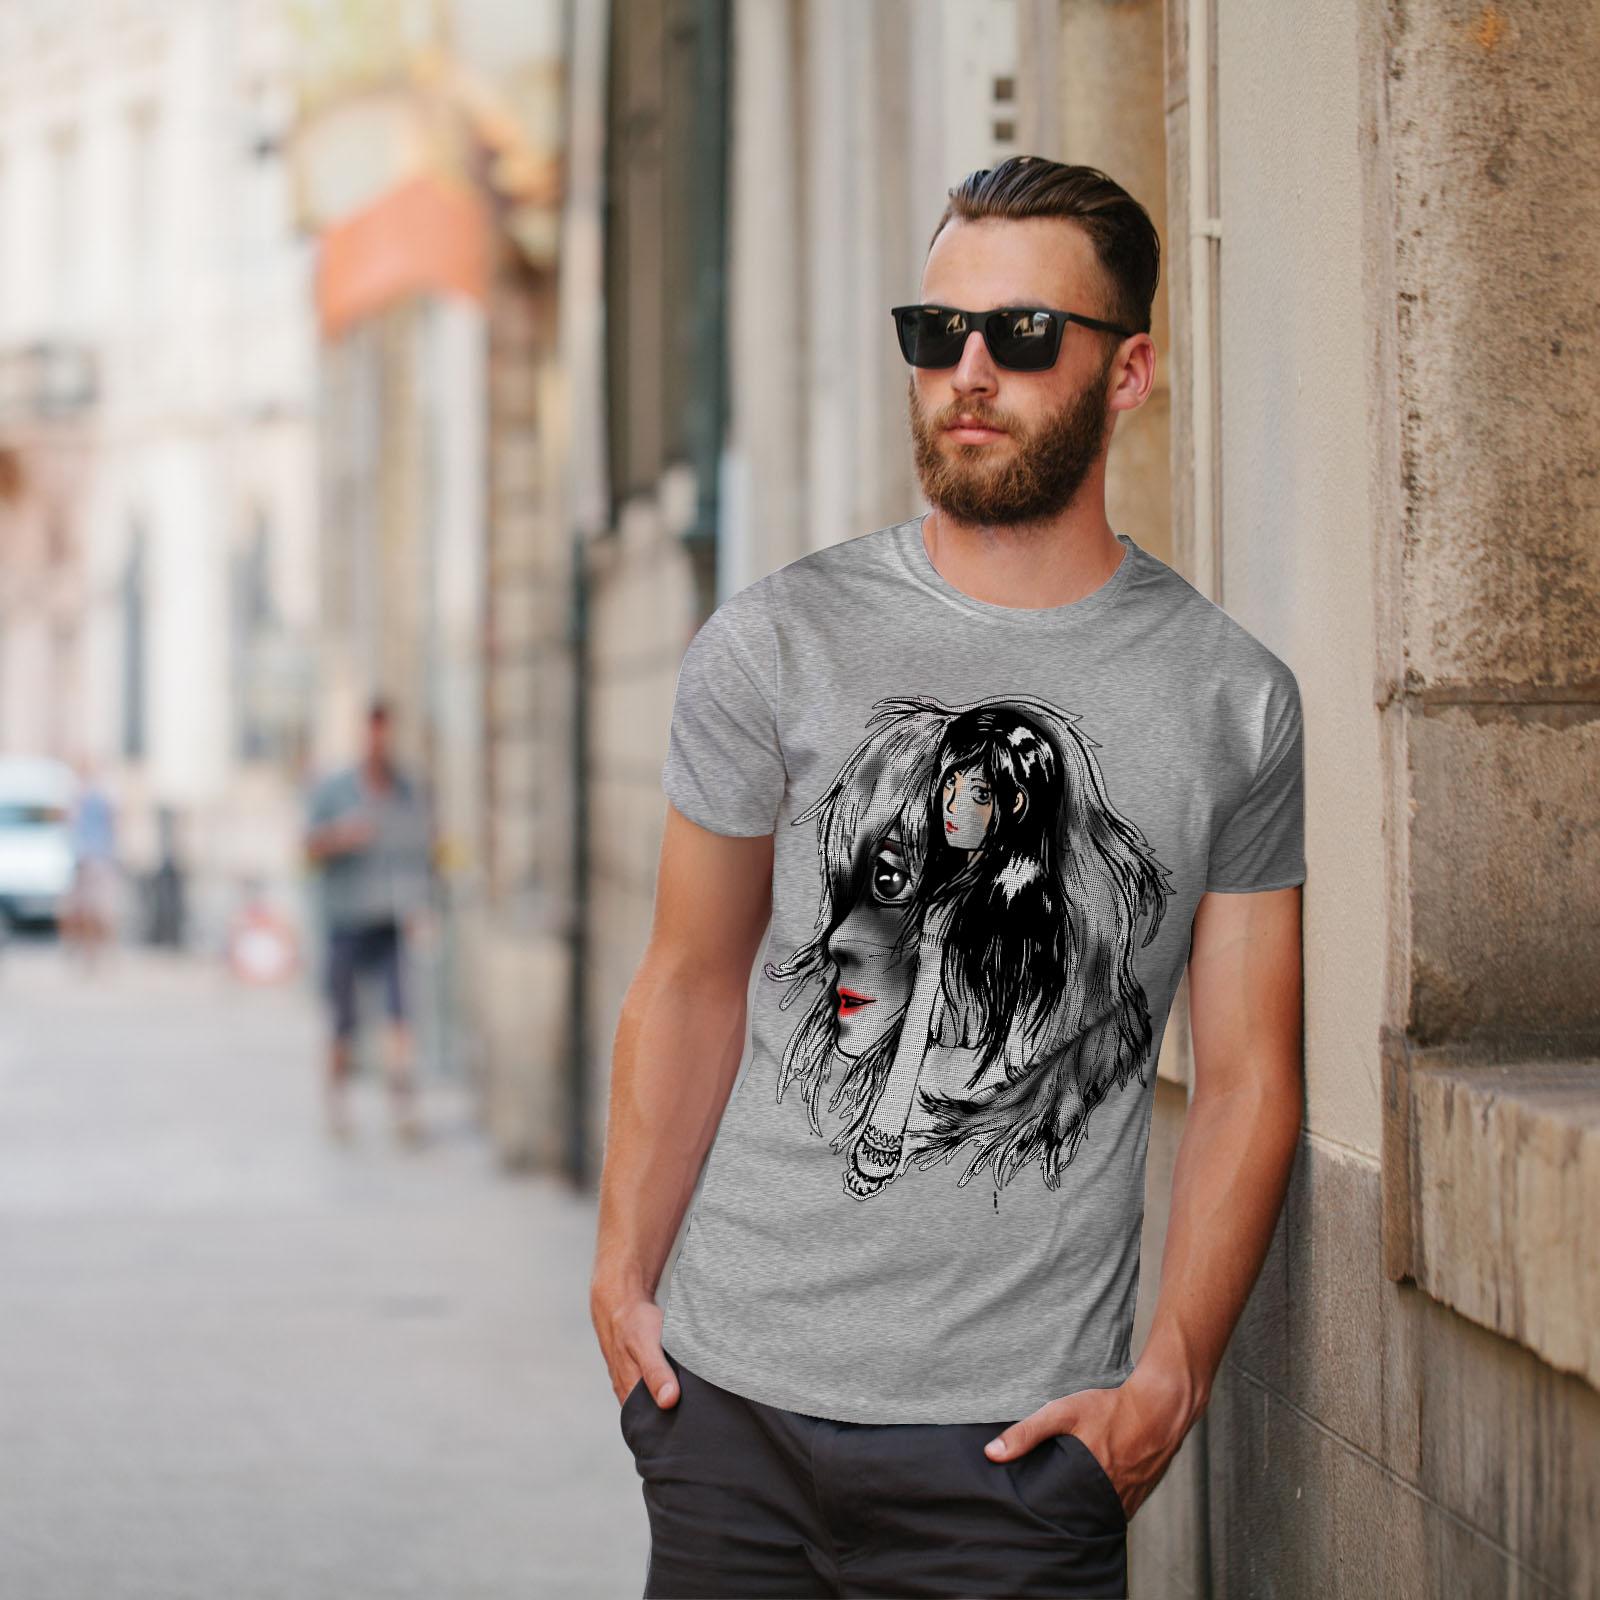 Wellcoda-bellissime-ANIME-Da-Uomo-T-shirt-misterioso-design-grafico-stampato-T-shirt miniatura 17